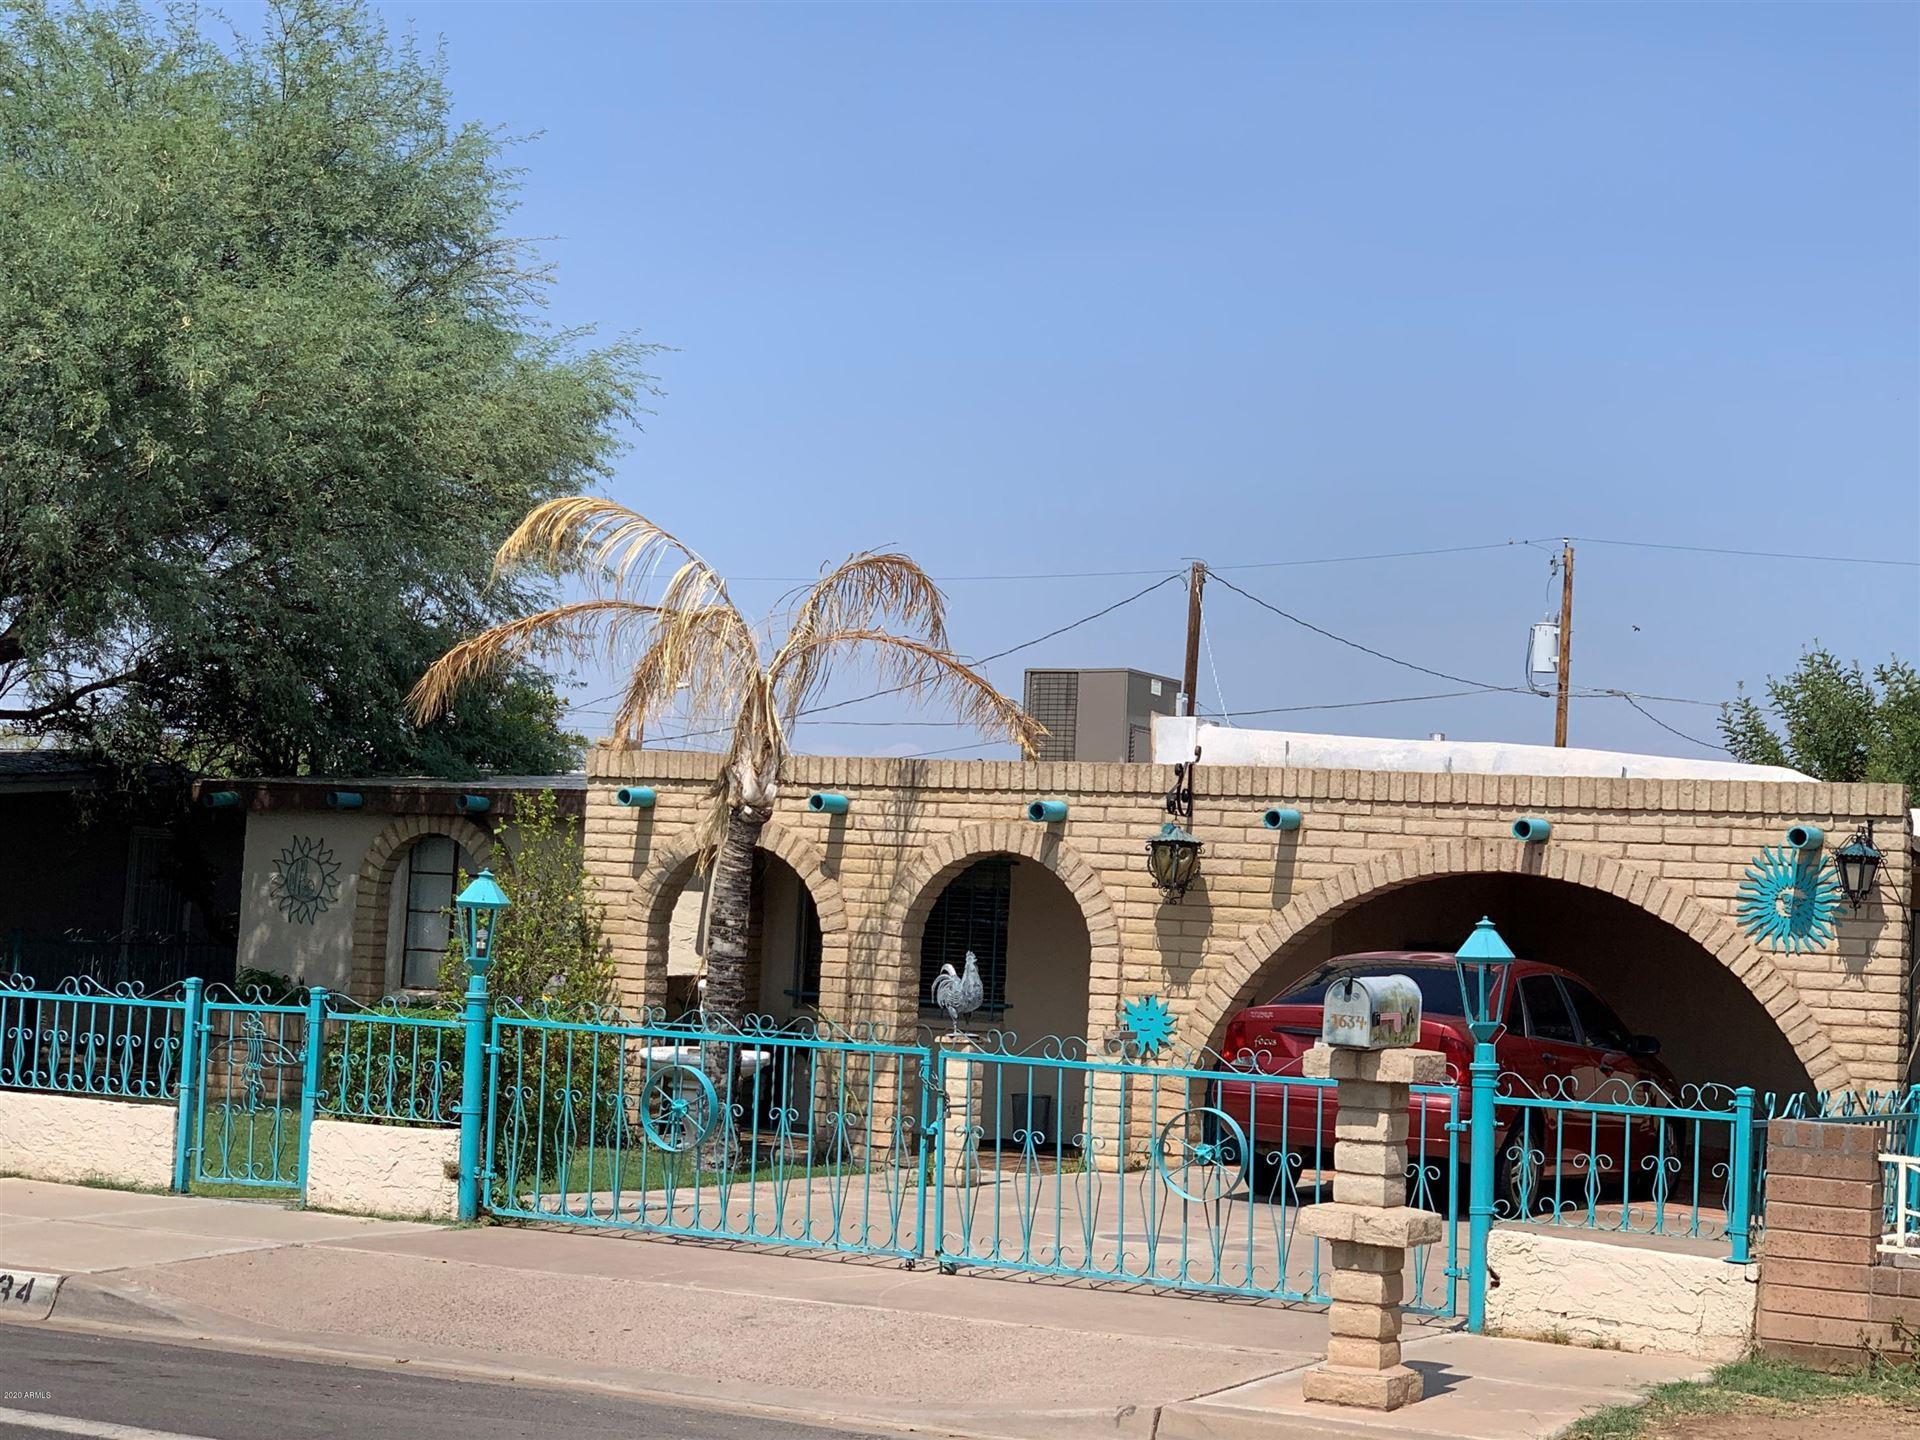 1634 W ROESER Road, Phoenix, AZ 85041 - MLS#: 6133243